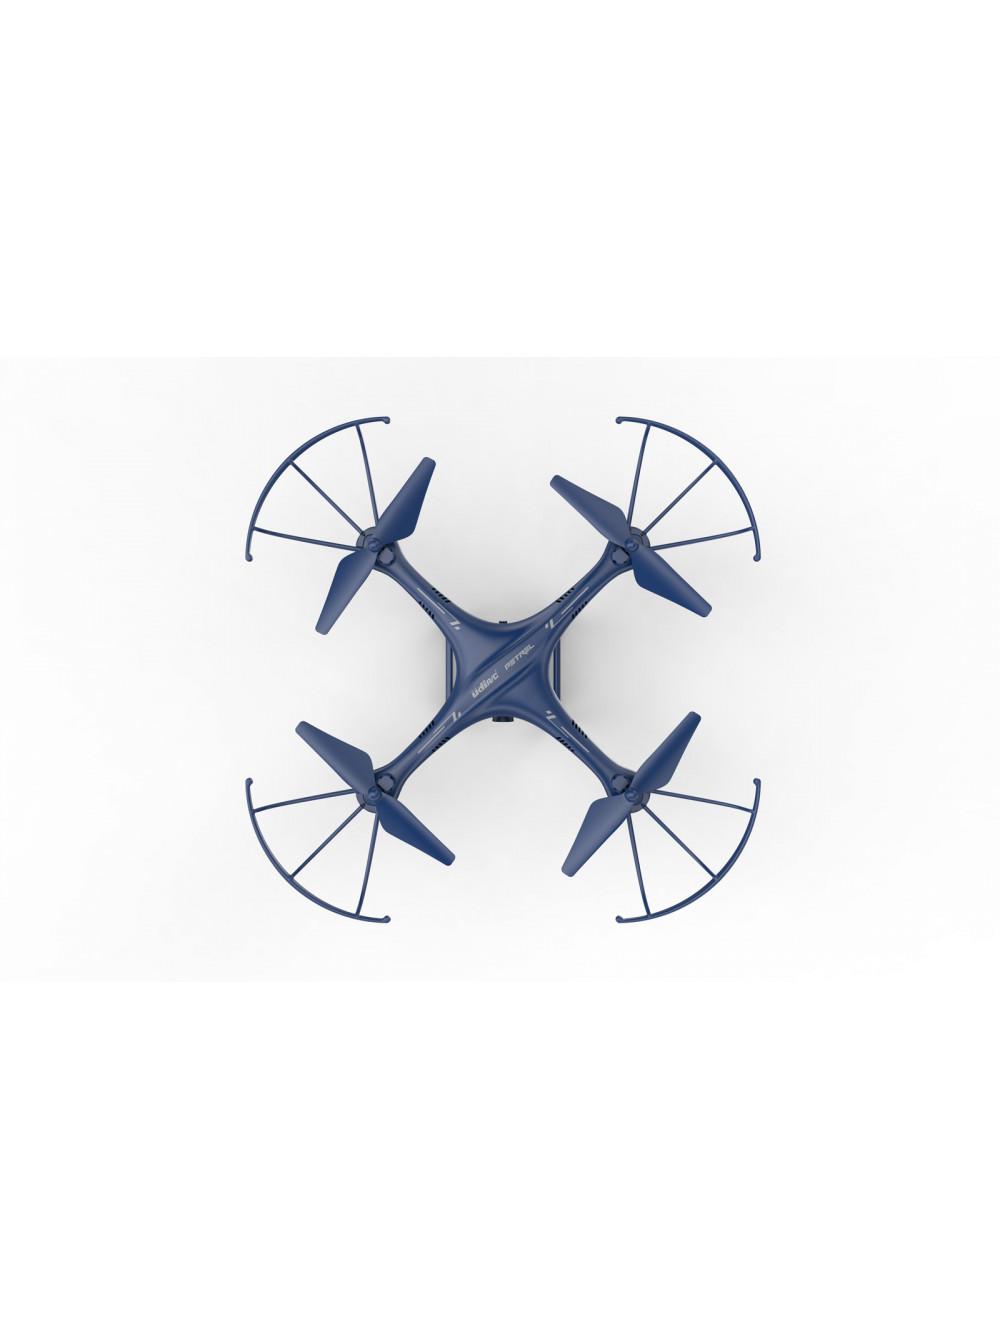 Квадрокоптер UDIRC U42W